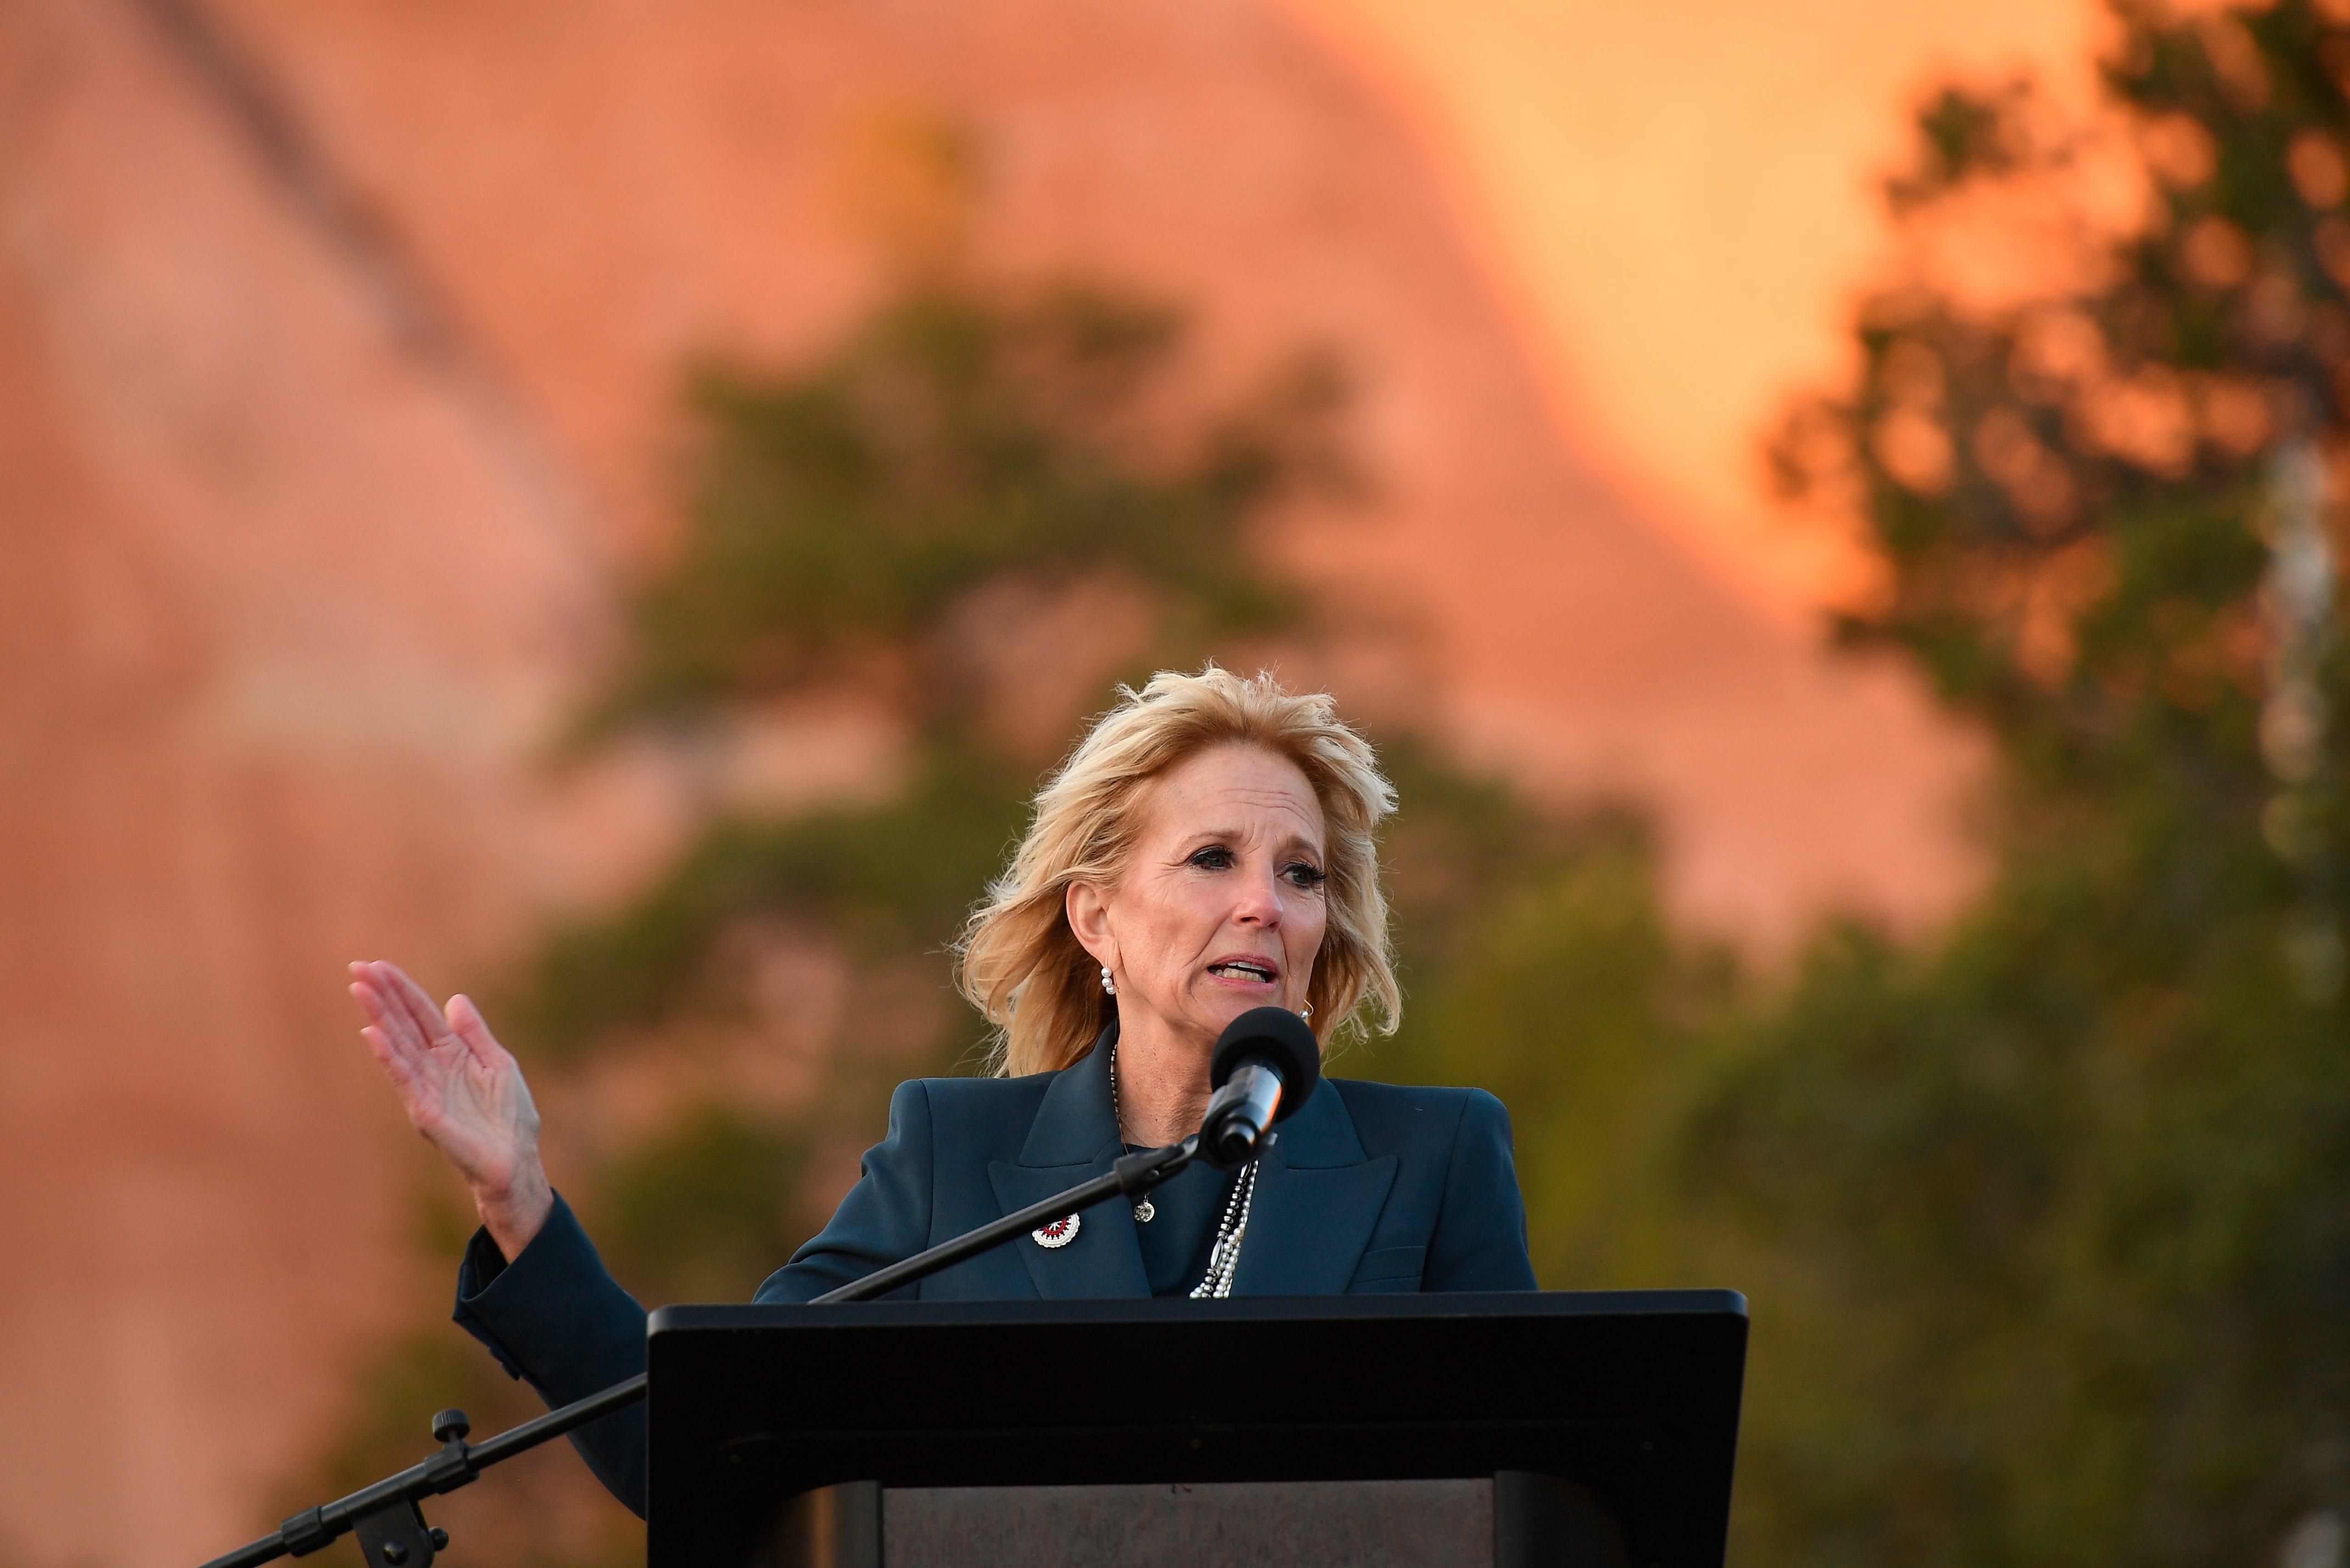 First lady Jill Biden speaks during a live radio address to the Navajo Nation at the Window Rock Navajo Tribal Park & Veterans Memorial in Window Rock, Ariz., on Thursday, April 22, 2021.(Mandel Ngan/Pool via AP)